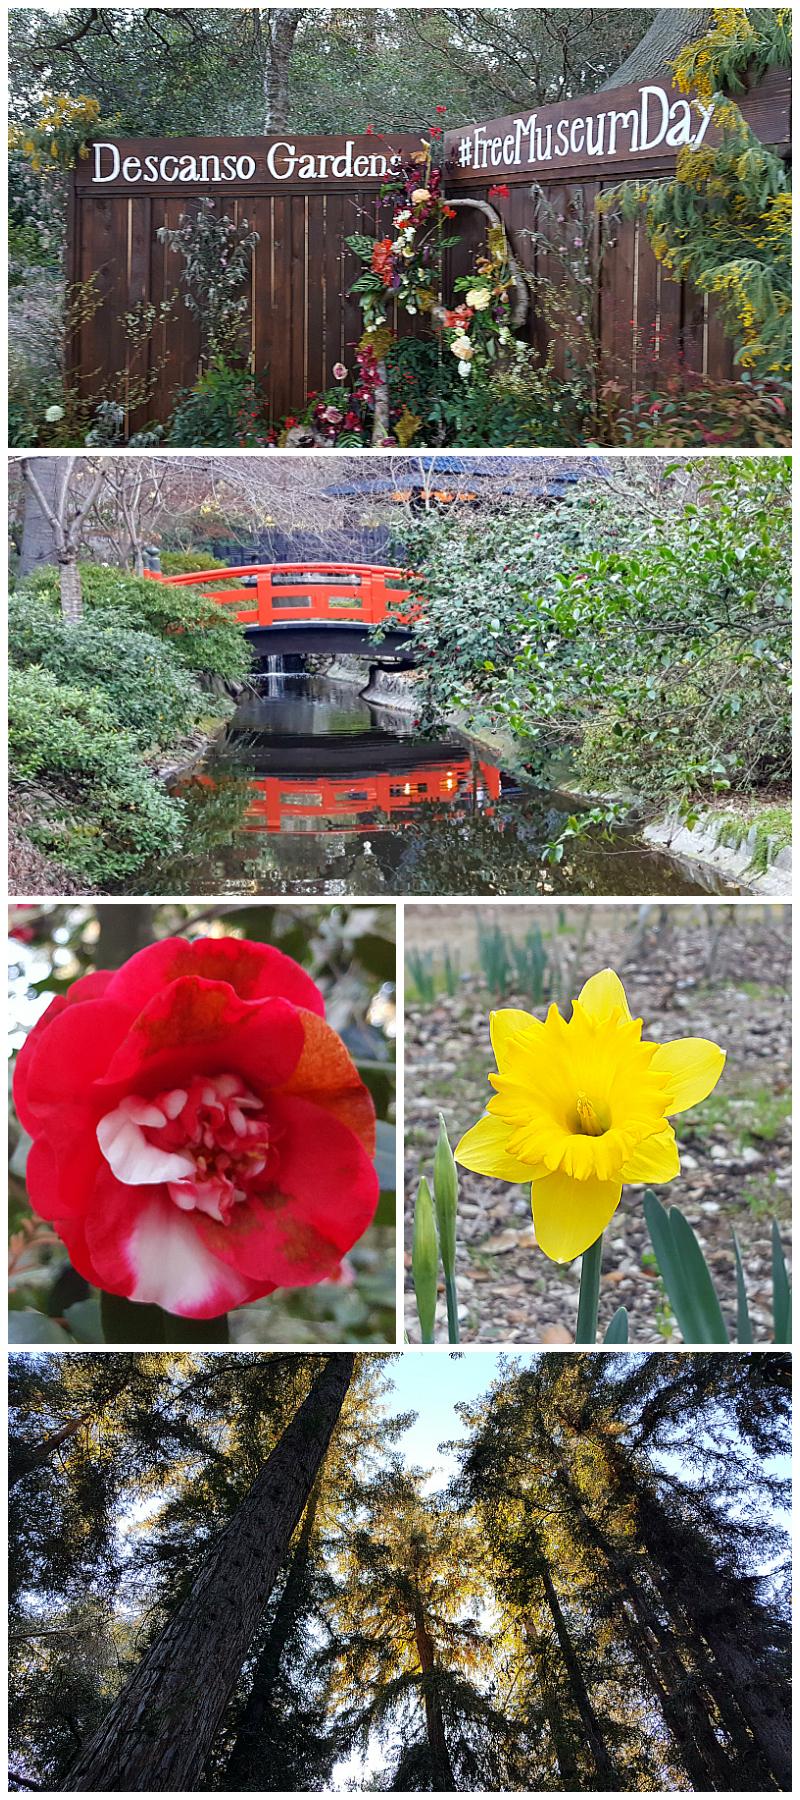 Descanso Gardens in La Canada Flintridge